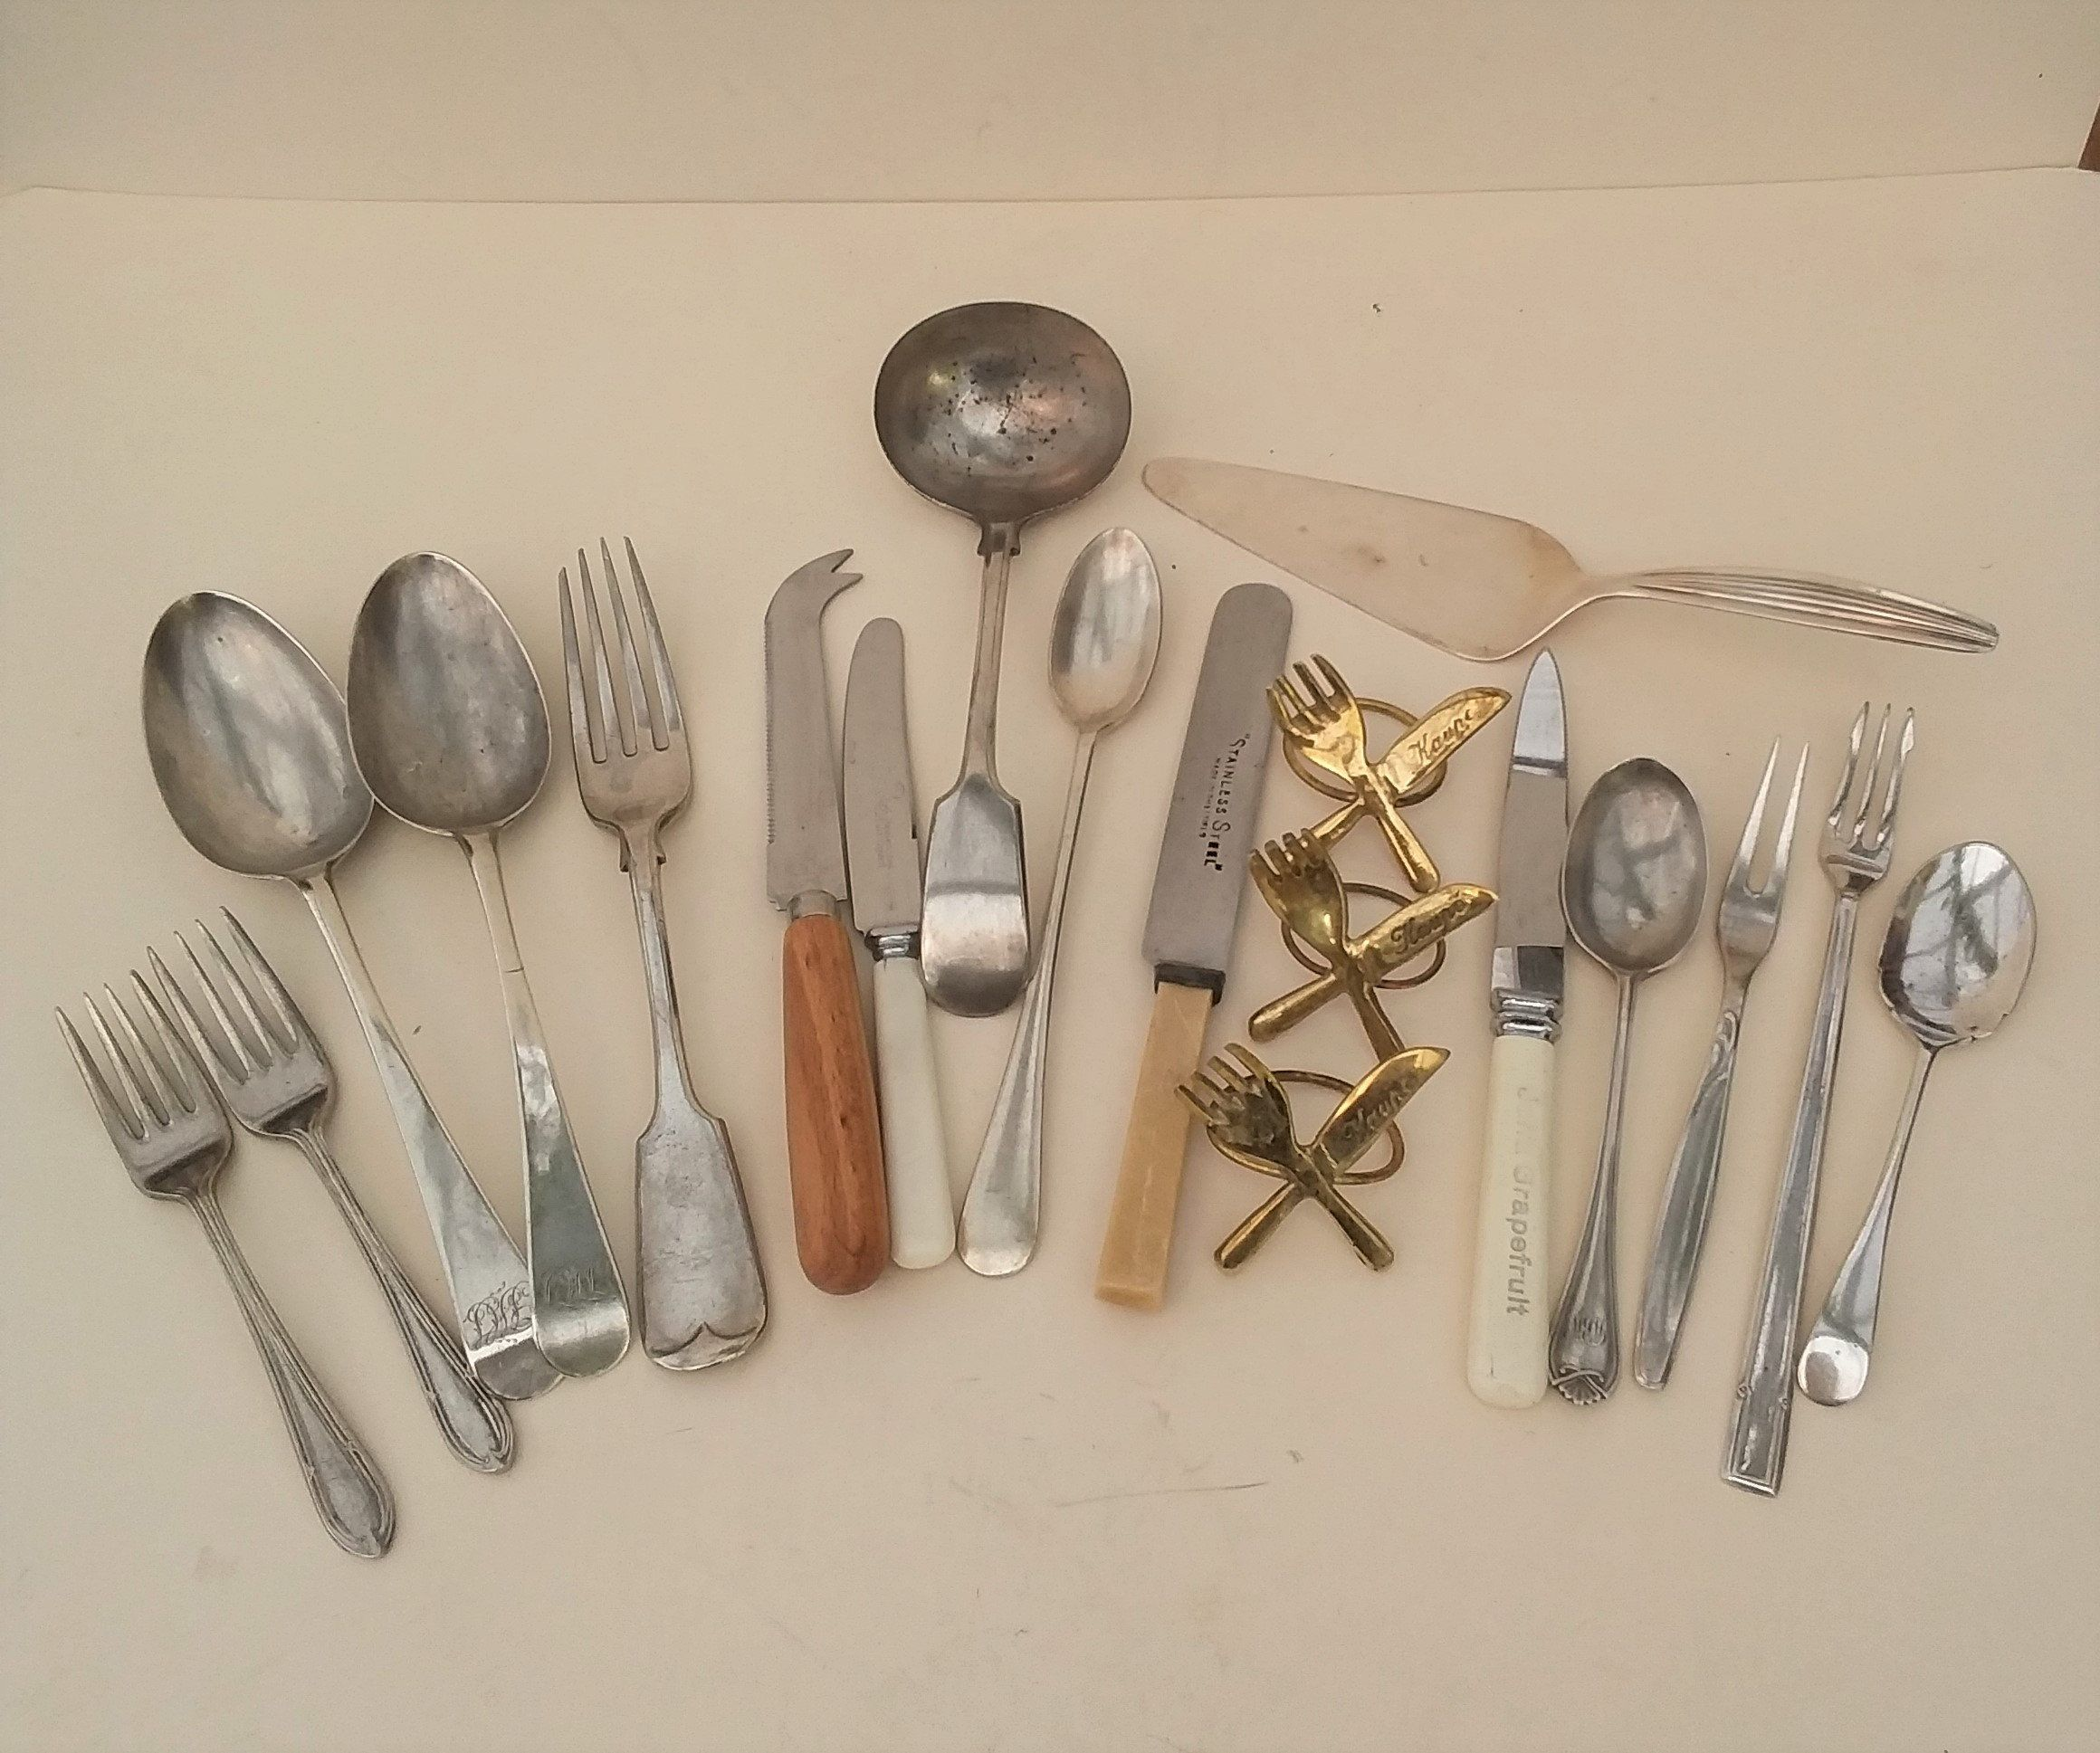 Lovely 19 piece vintage flatware